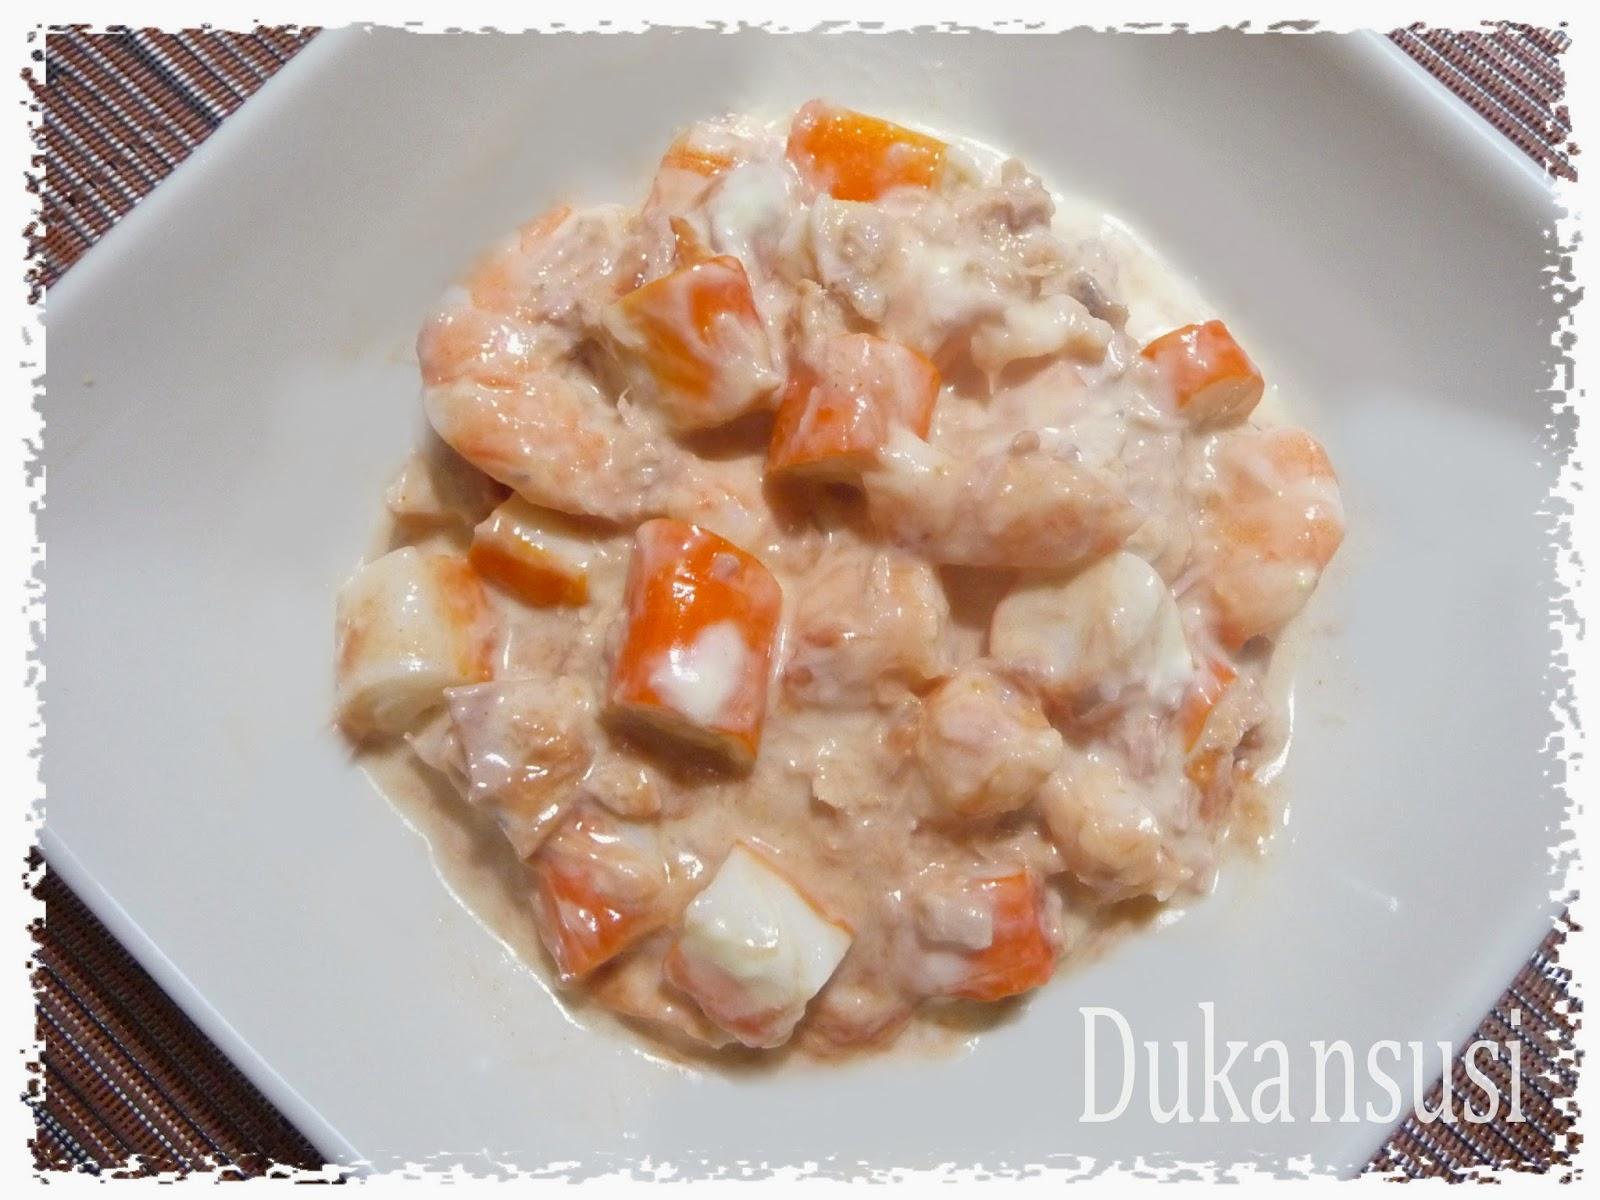 Recetas dukan dukansusi coctel de marisco con salsa rosa dukan fase ataque - Coctel de marisco ingredientes ...